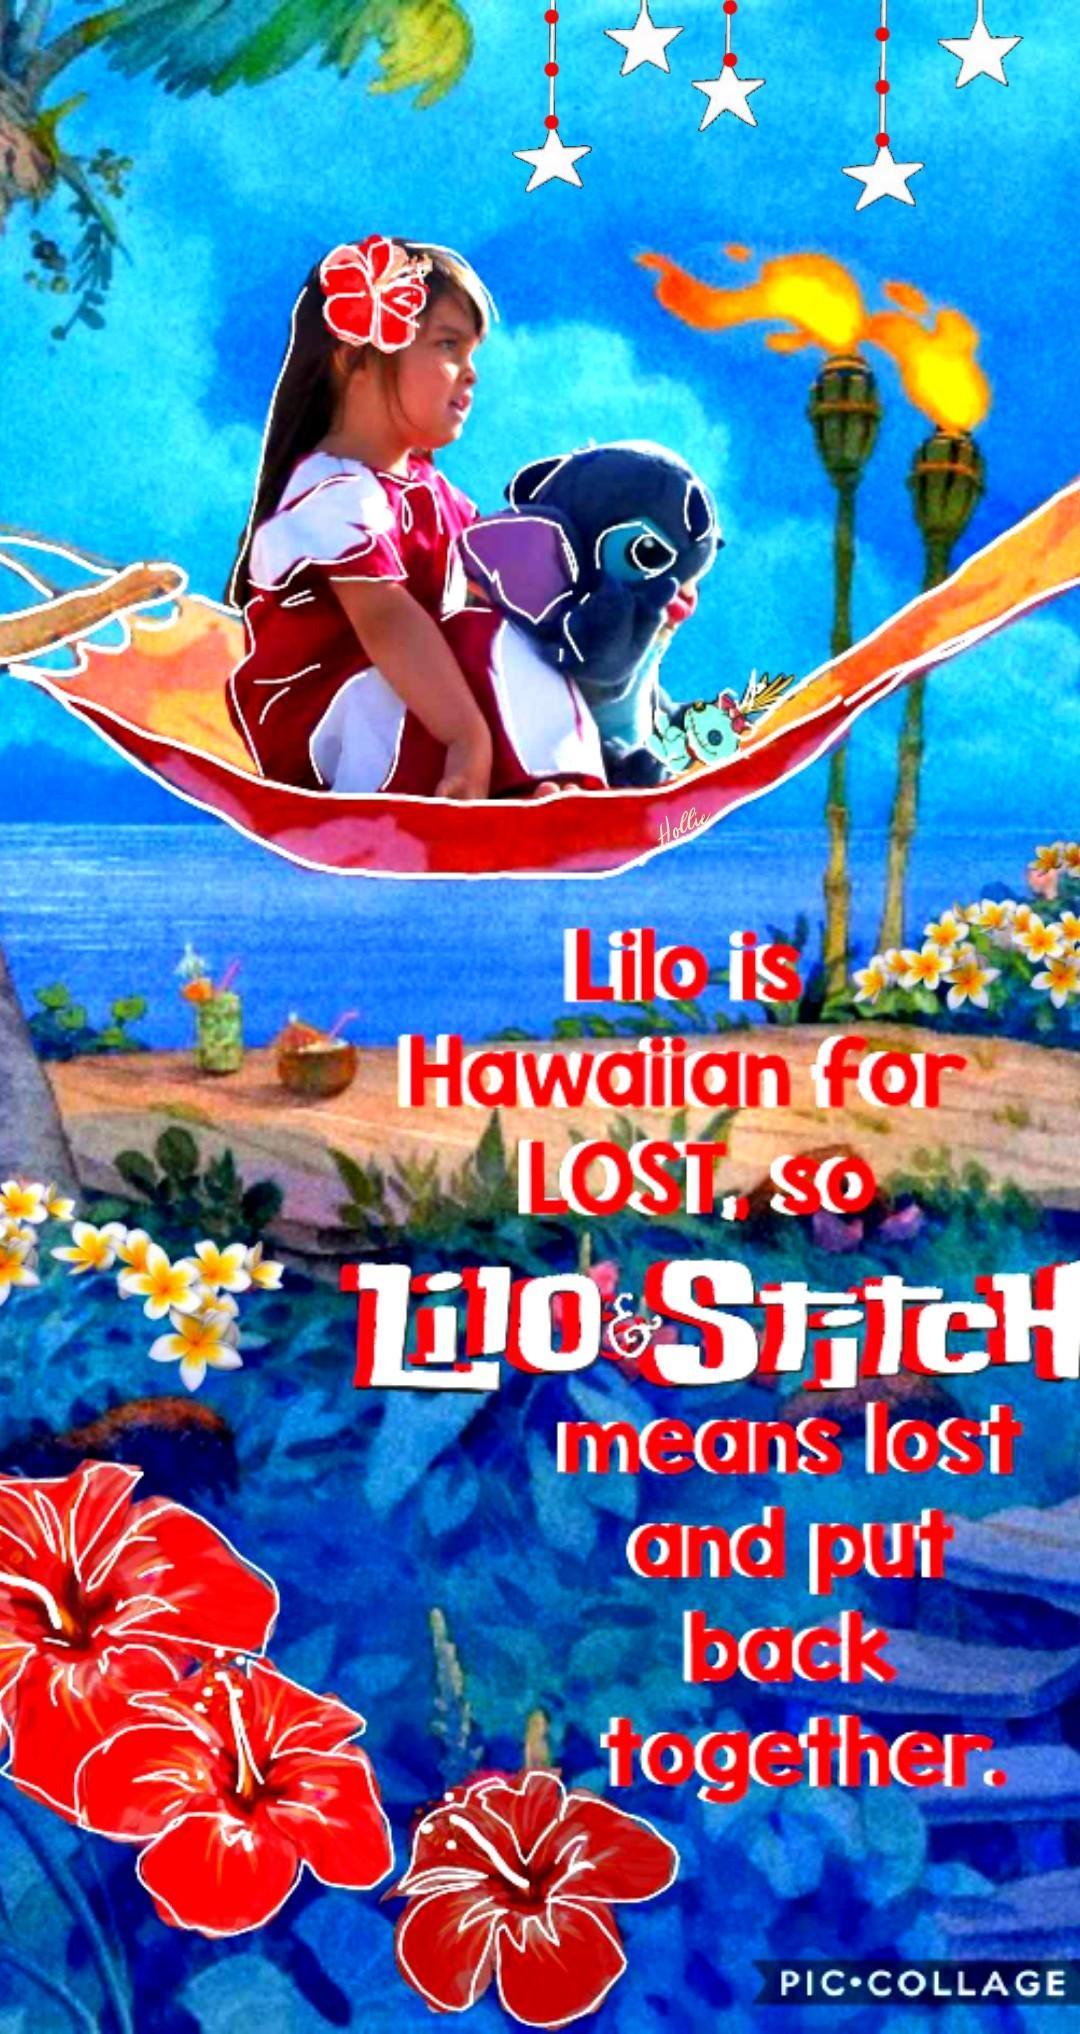 """lost and put back together""  . ohana lilo and stitch"